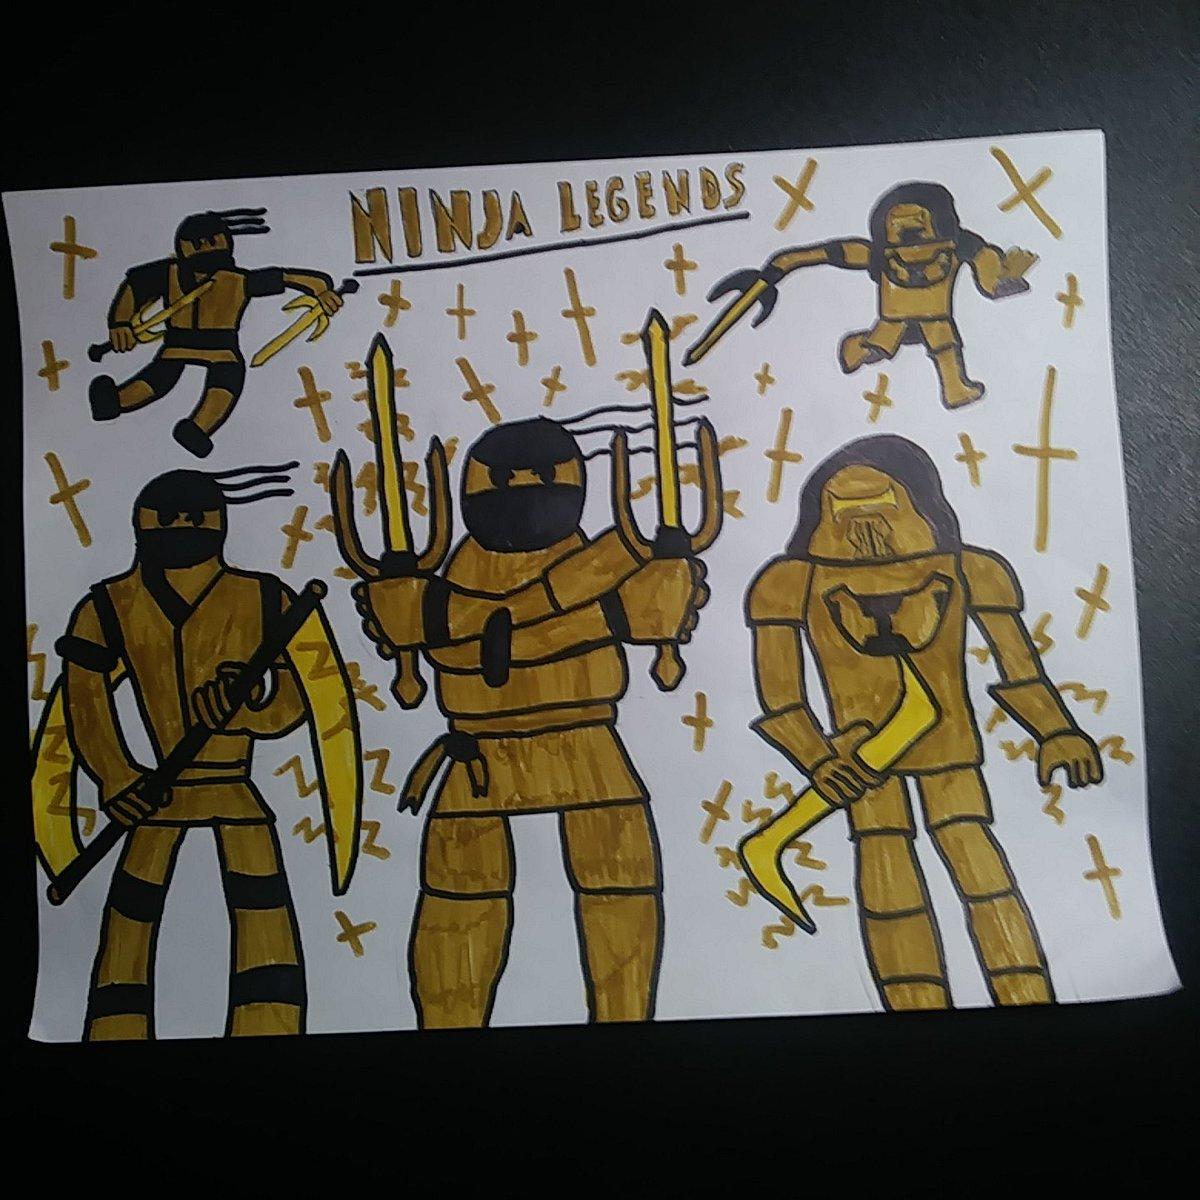 Dragon Master Scriptbloxian Studios Roblox Ninja Legends Wiki Scriptbloxian Scriptbloxian Twitter